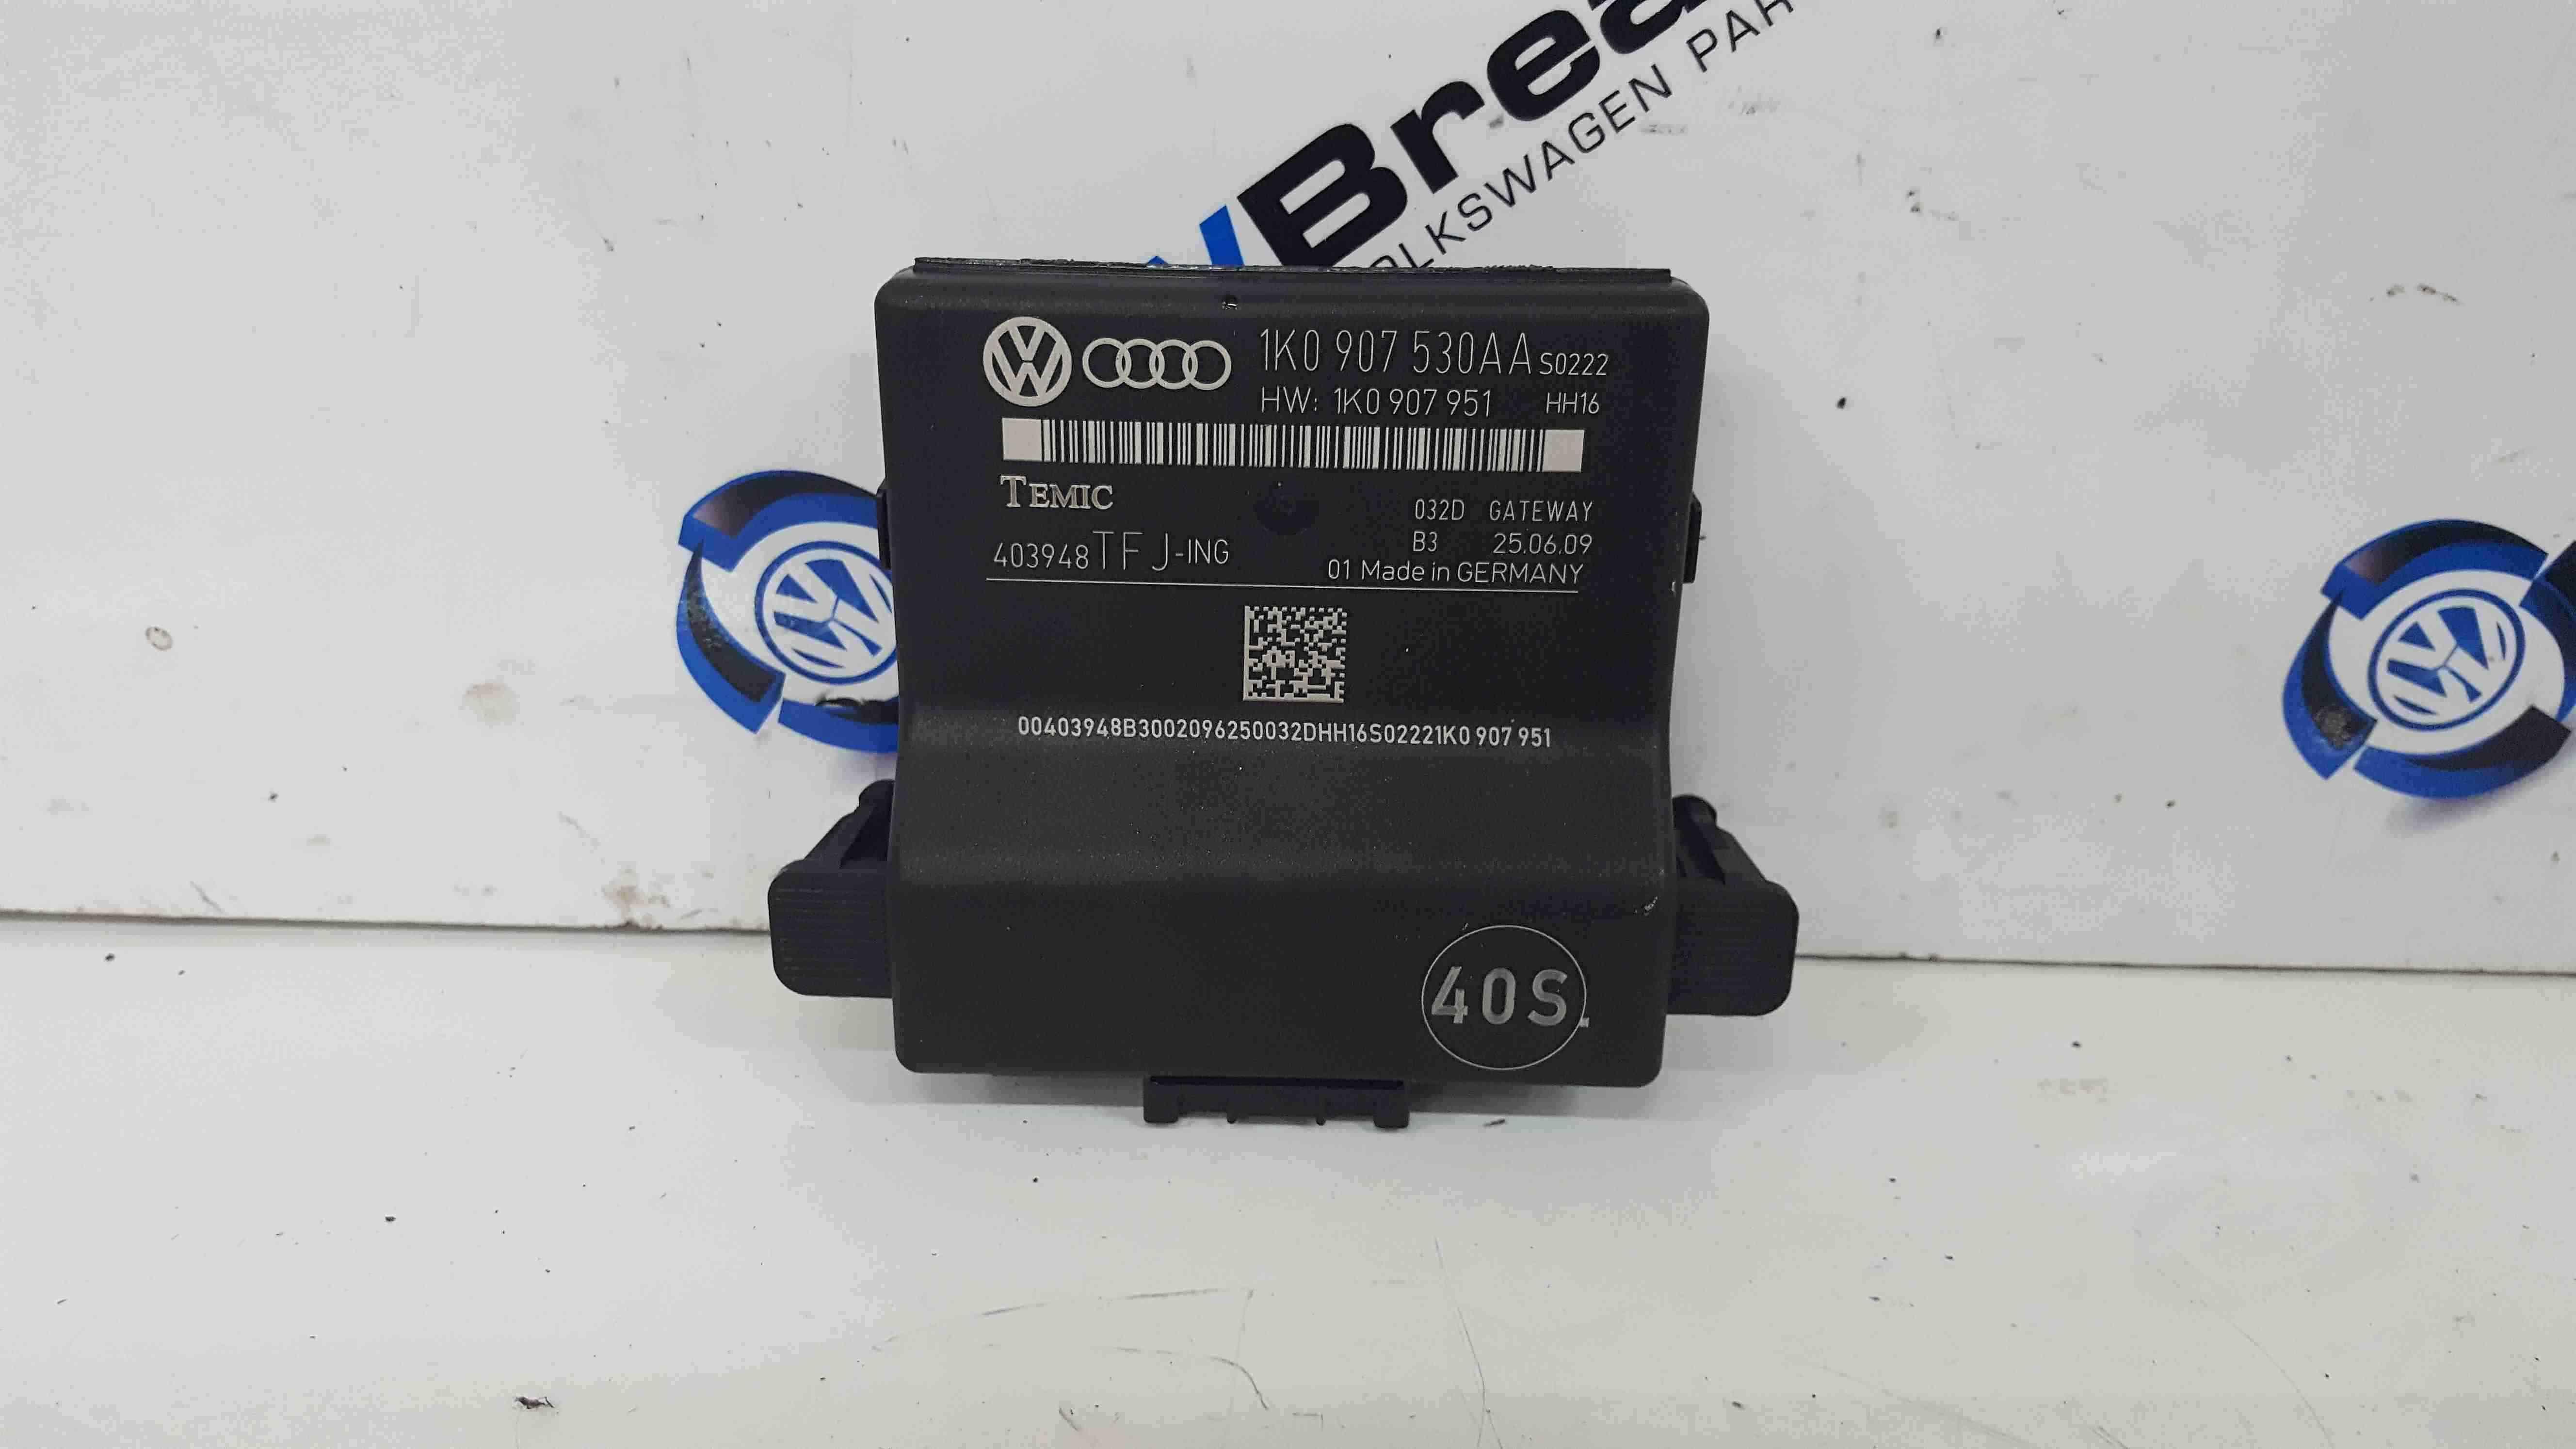 Volkswagen Golf MK6 2009-2012 Gateway Control Module 1k0907530aa